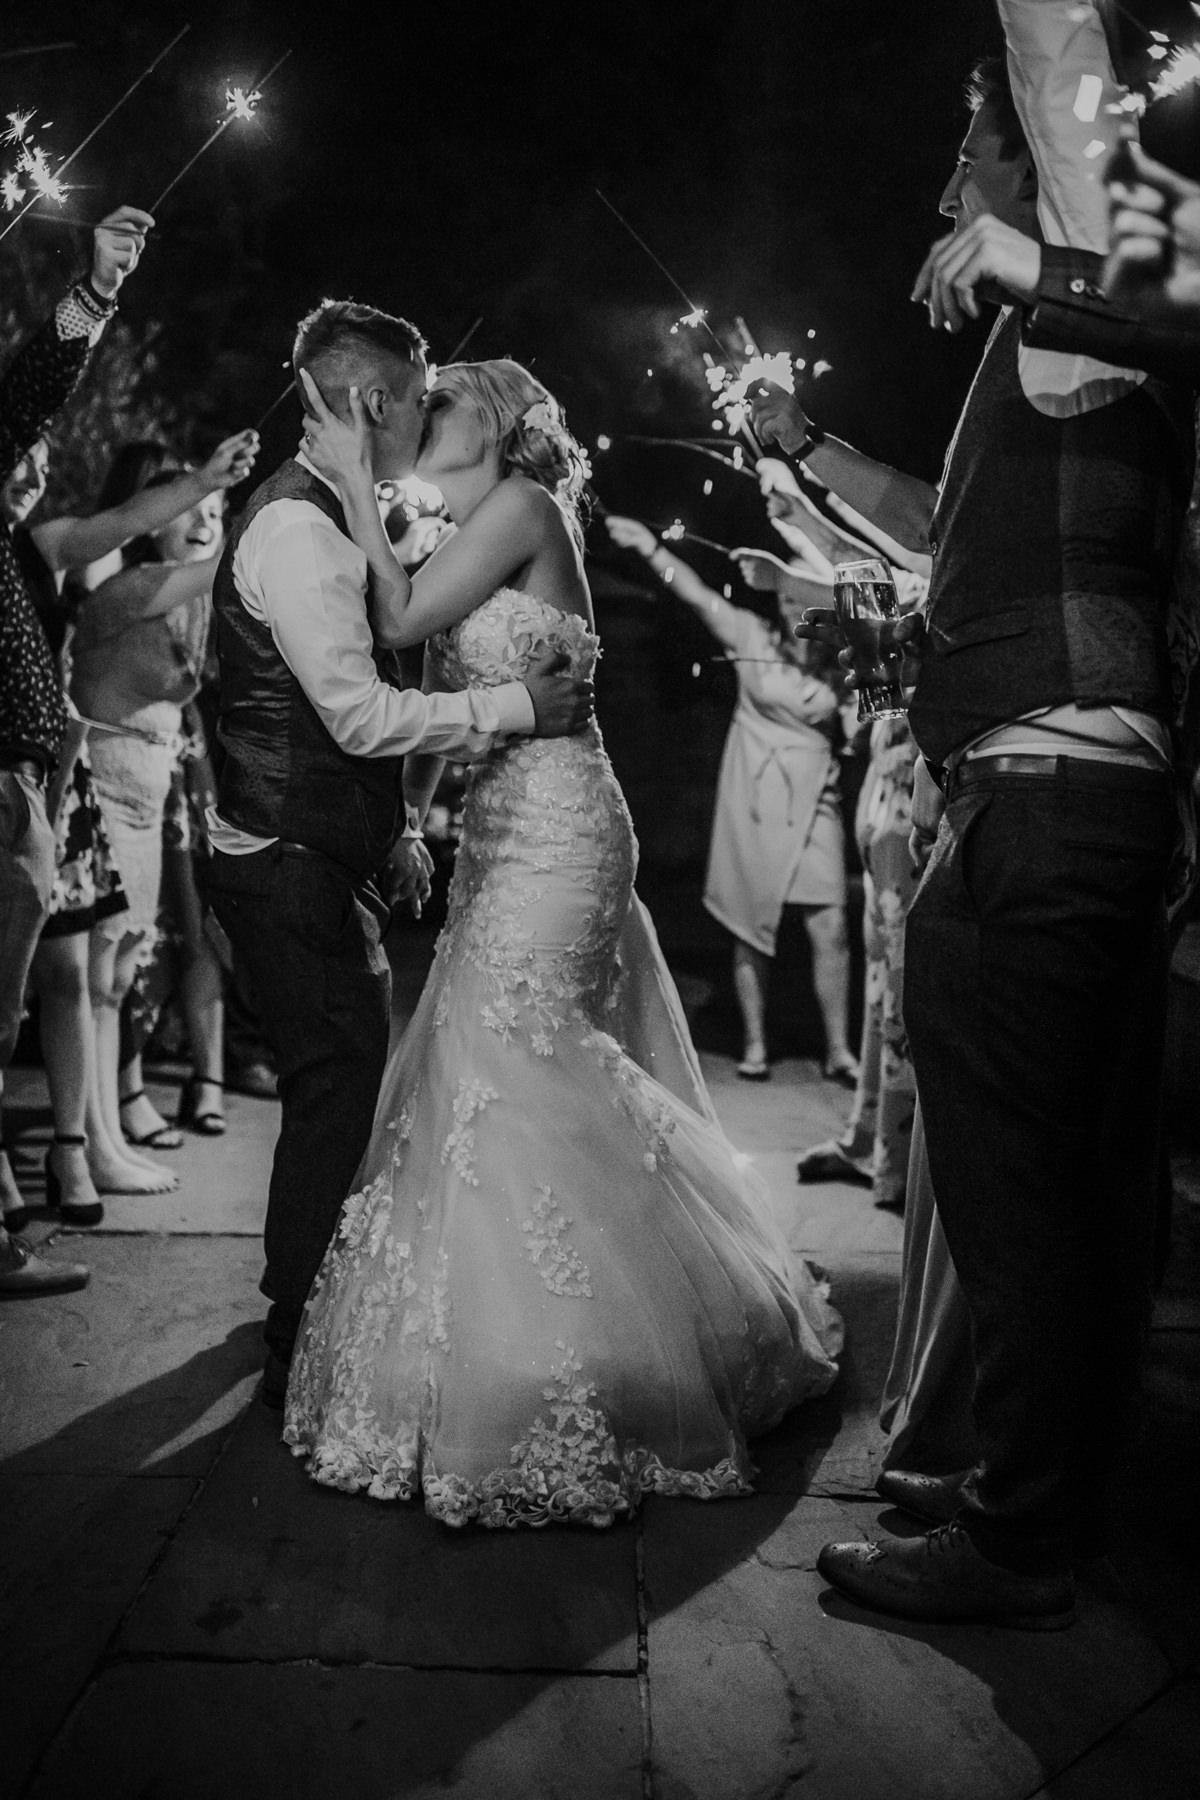 bride and groom kiss during the sparklers shot at Shustoke Barn wedding venue